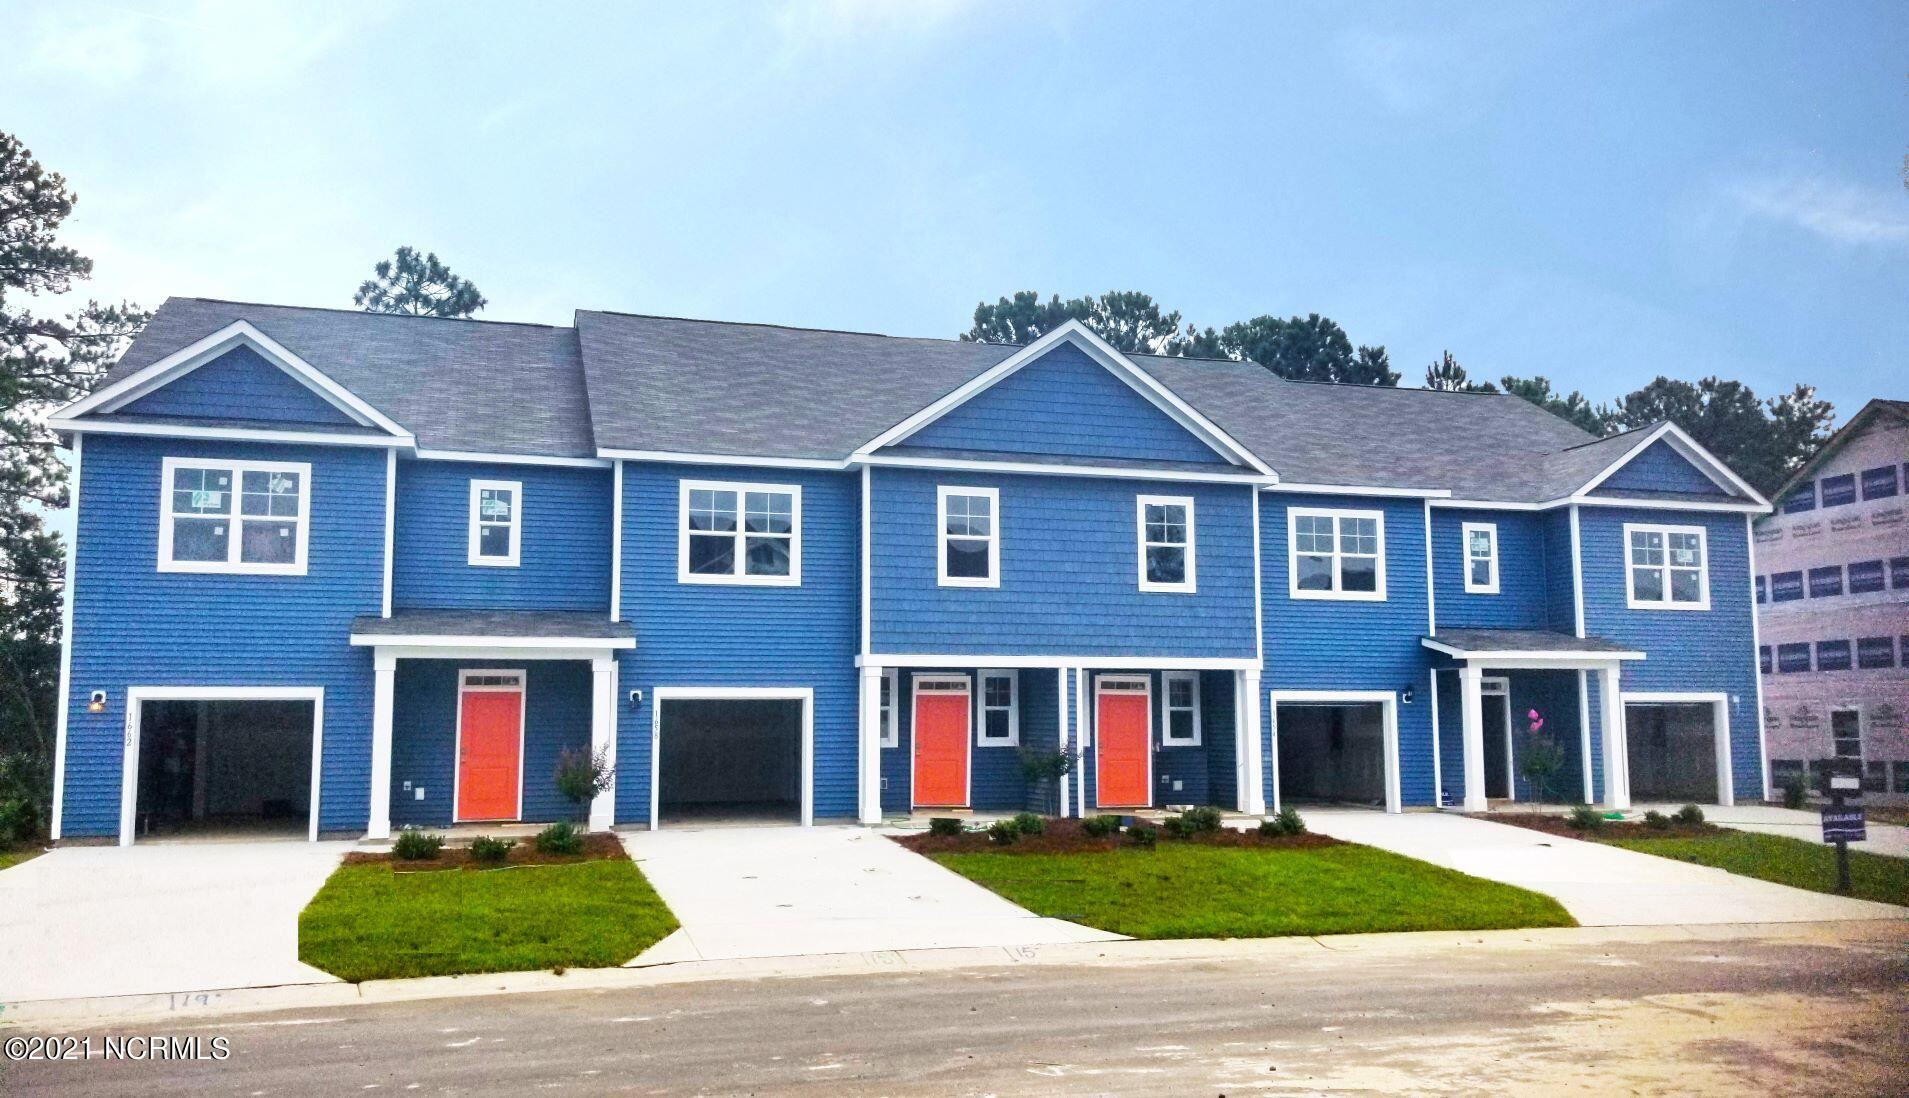 Photo of 1654 Killdeer Lane Lot 54, Wilmington, NC 28411 (MLS # 100273925)